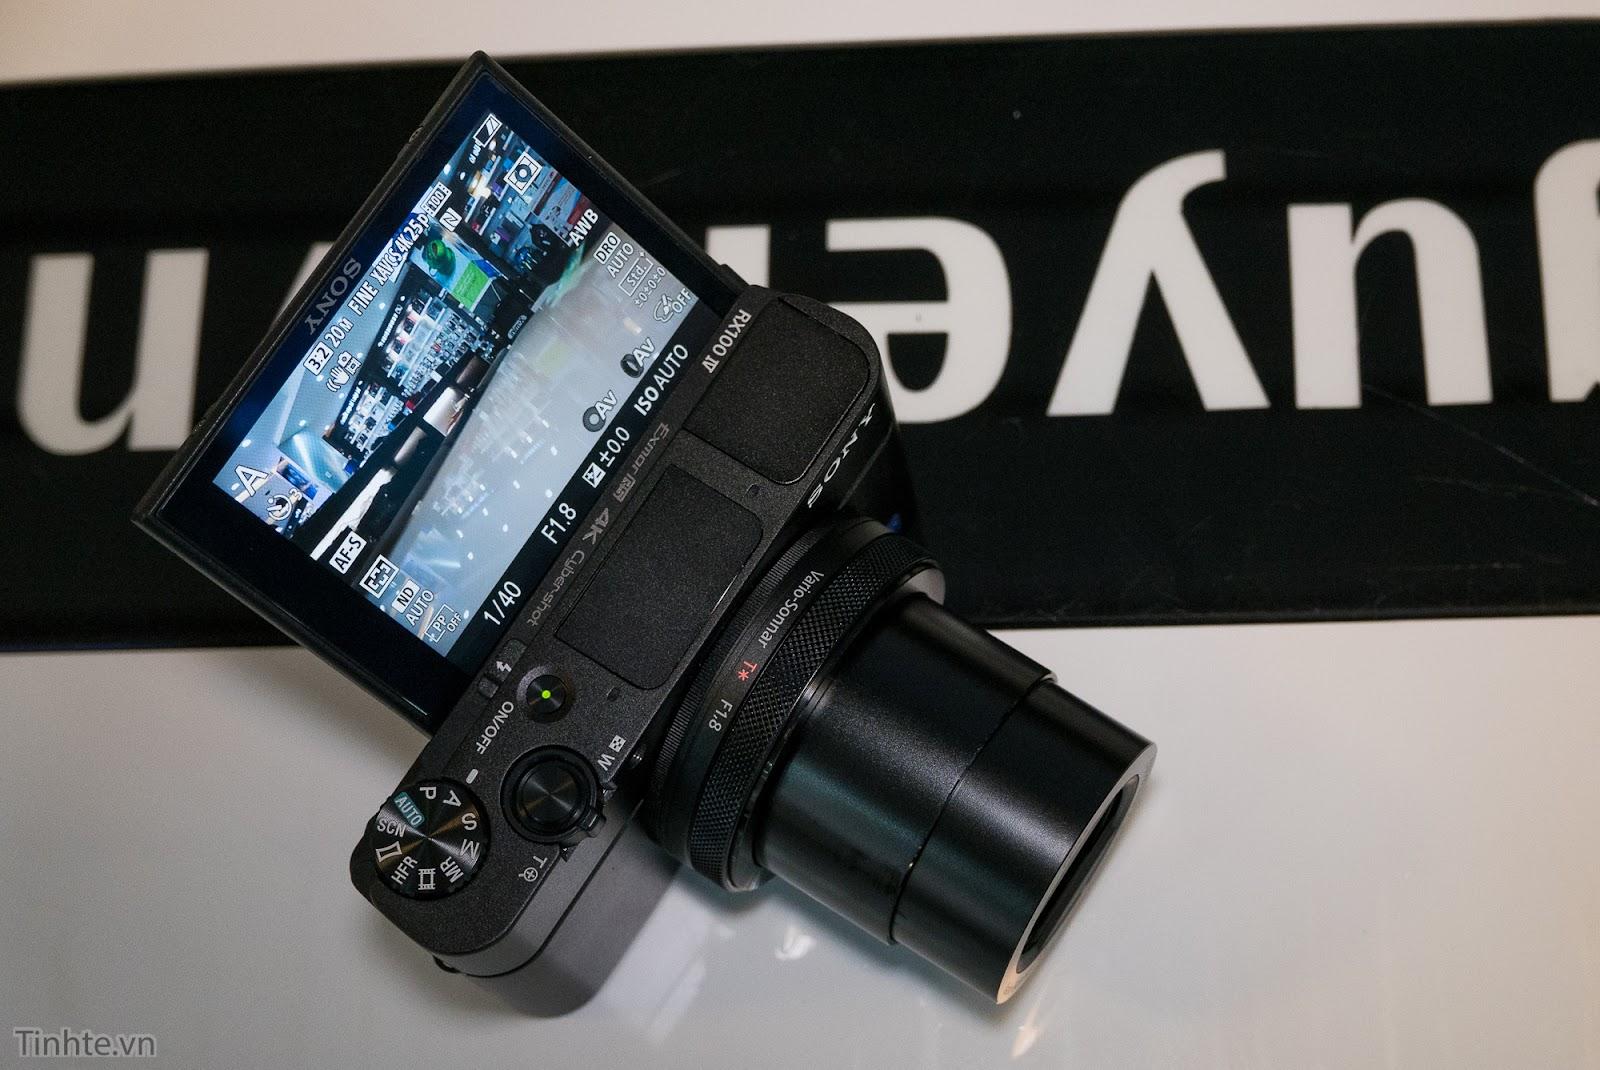 Tinhte.vn_Sony_RX100_mark_IV_4-18.